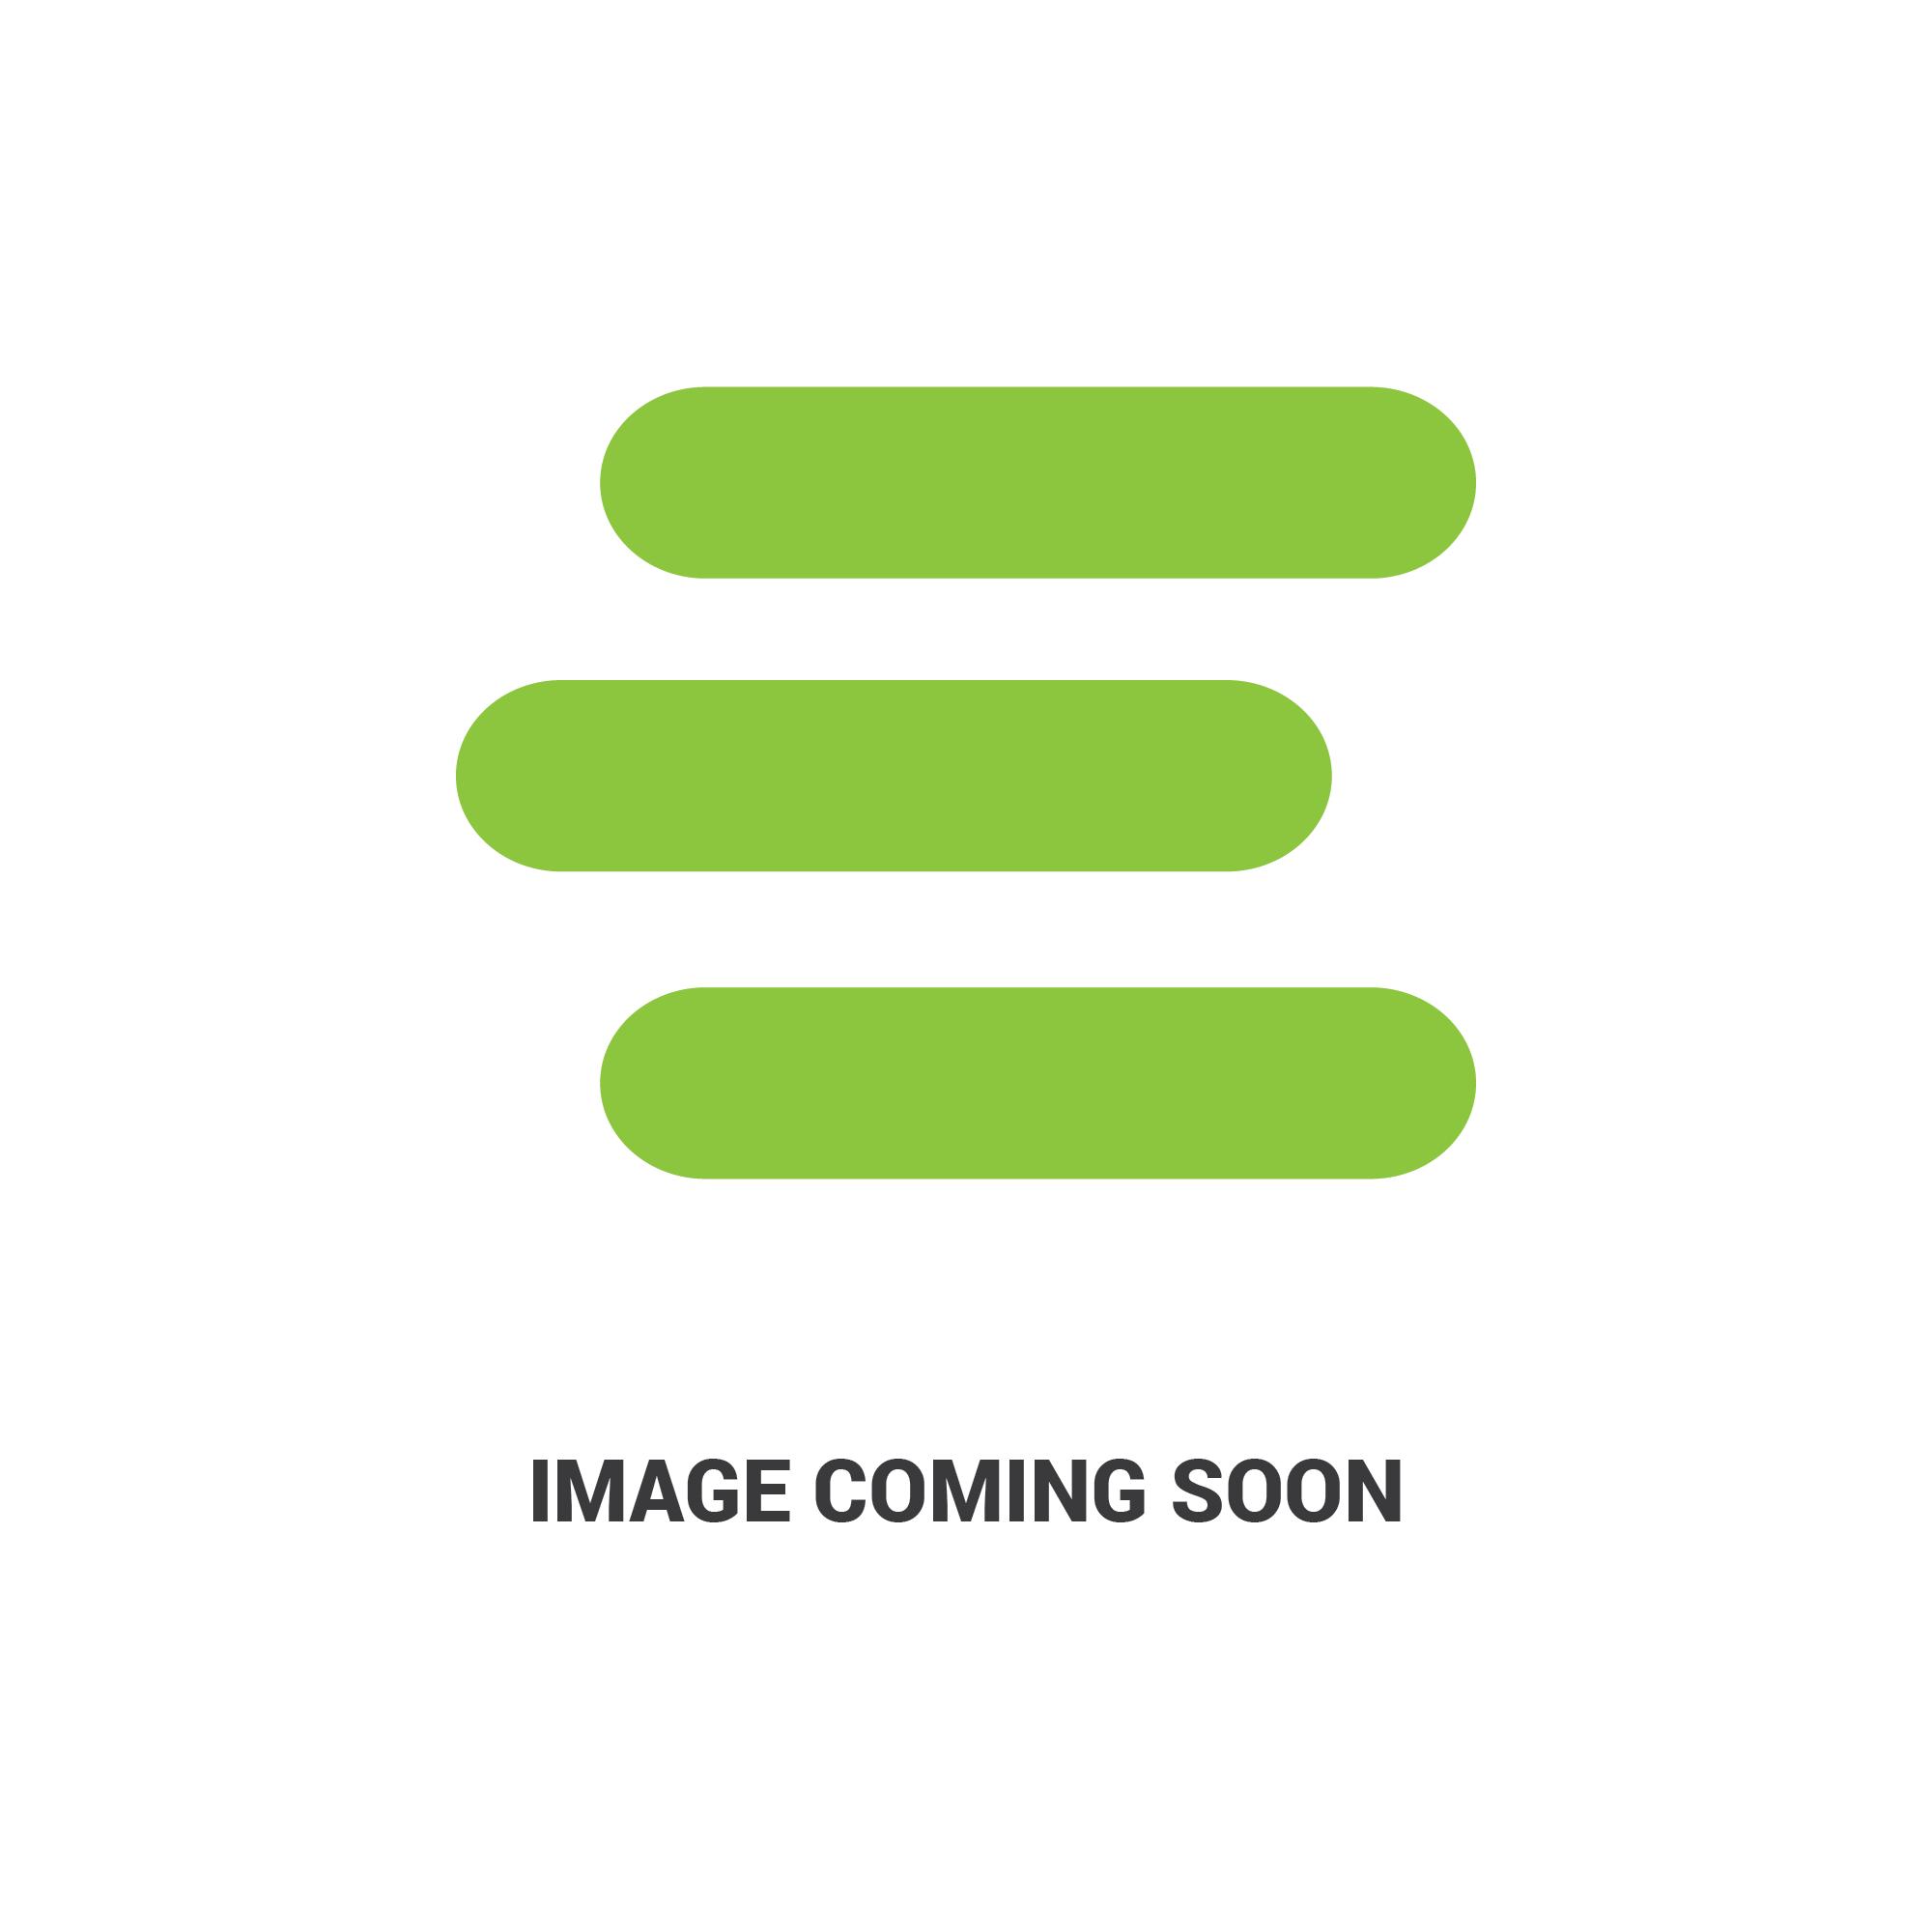 E-70000-16631edit 1.jpg